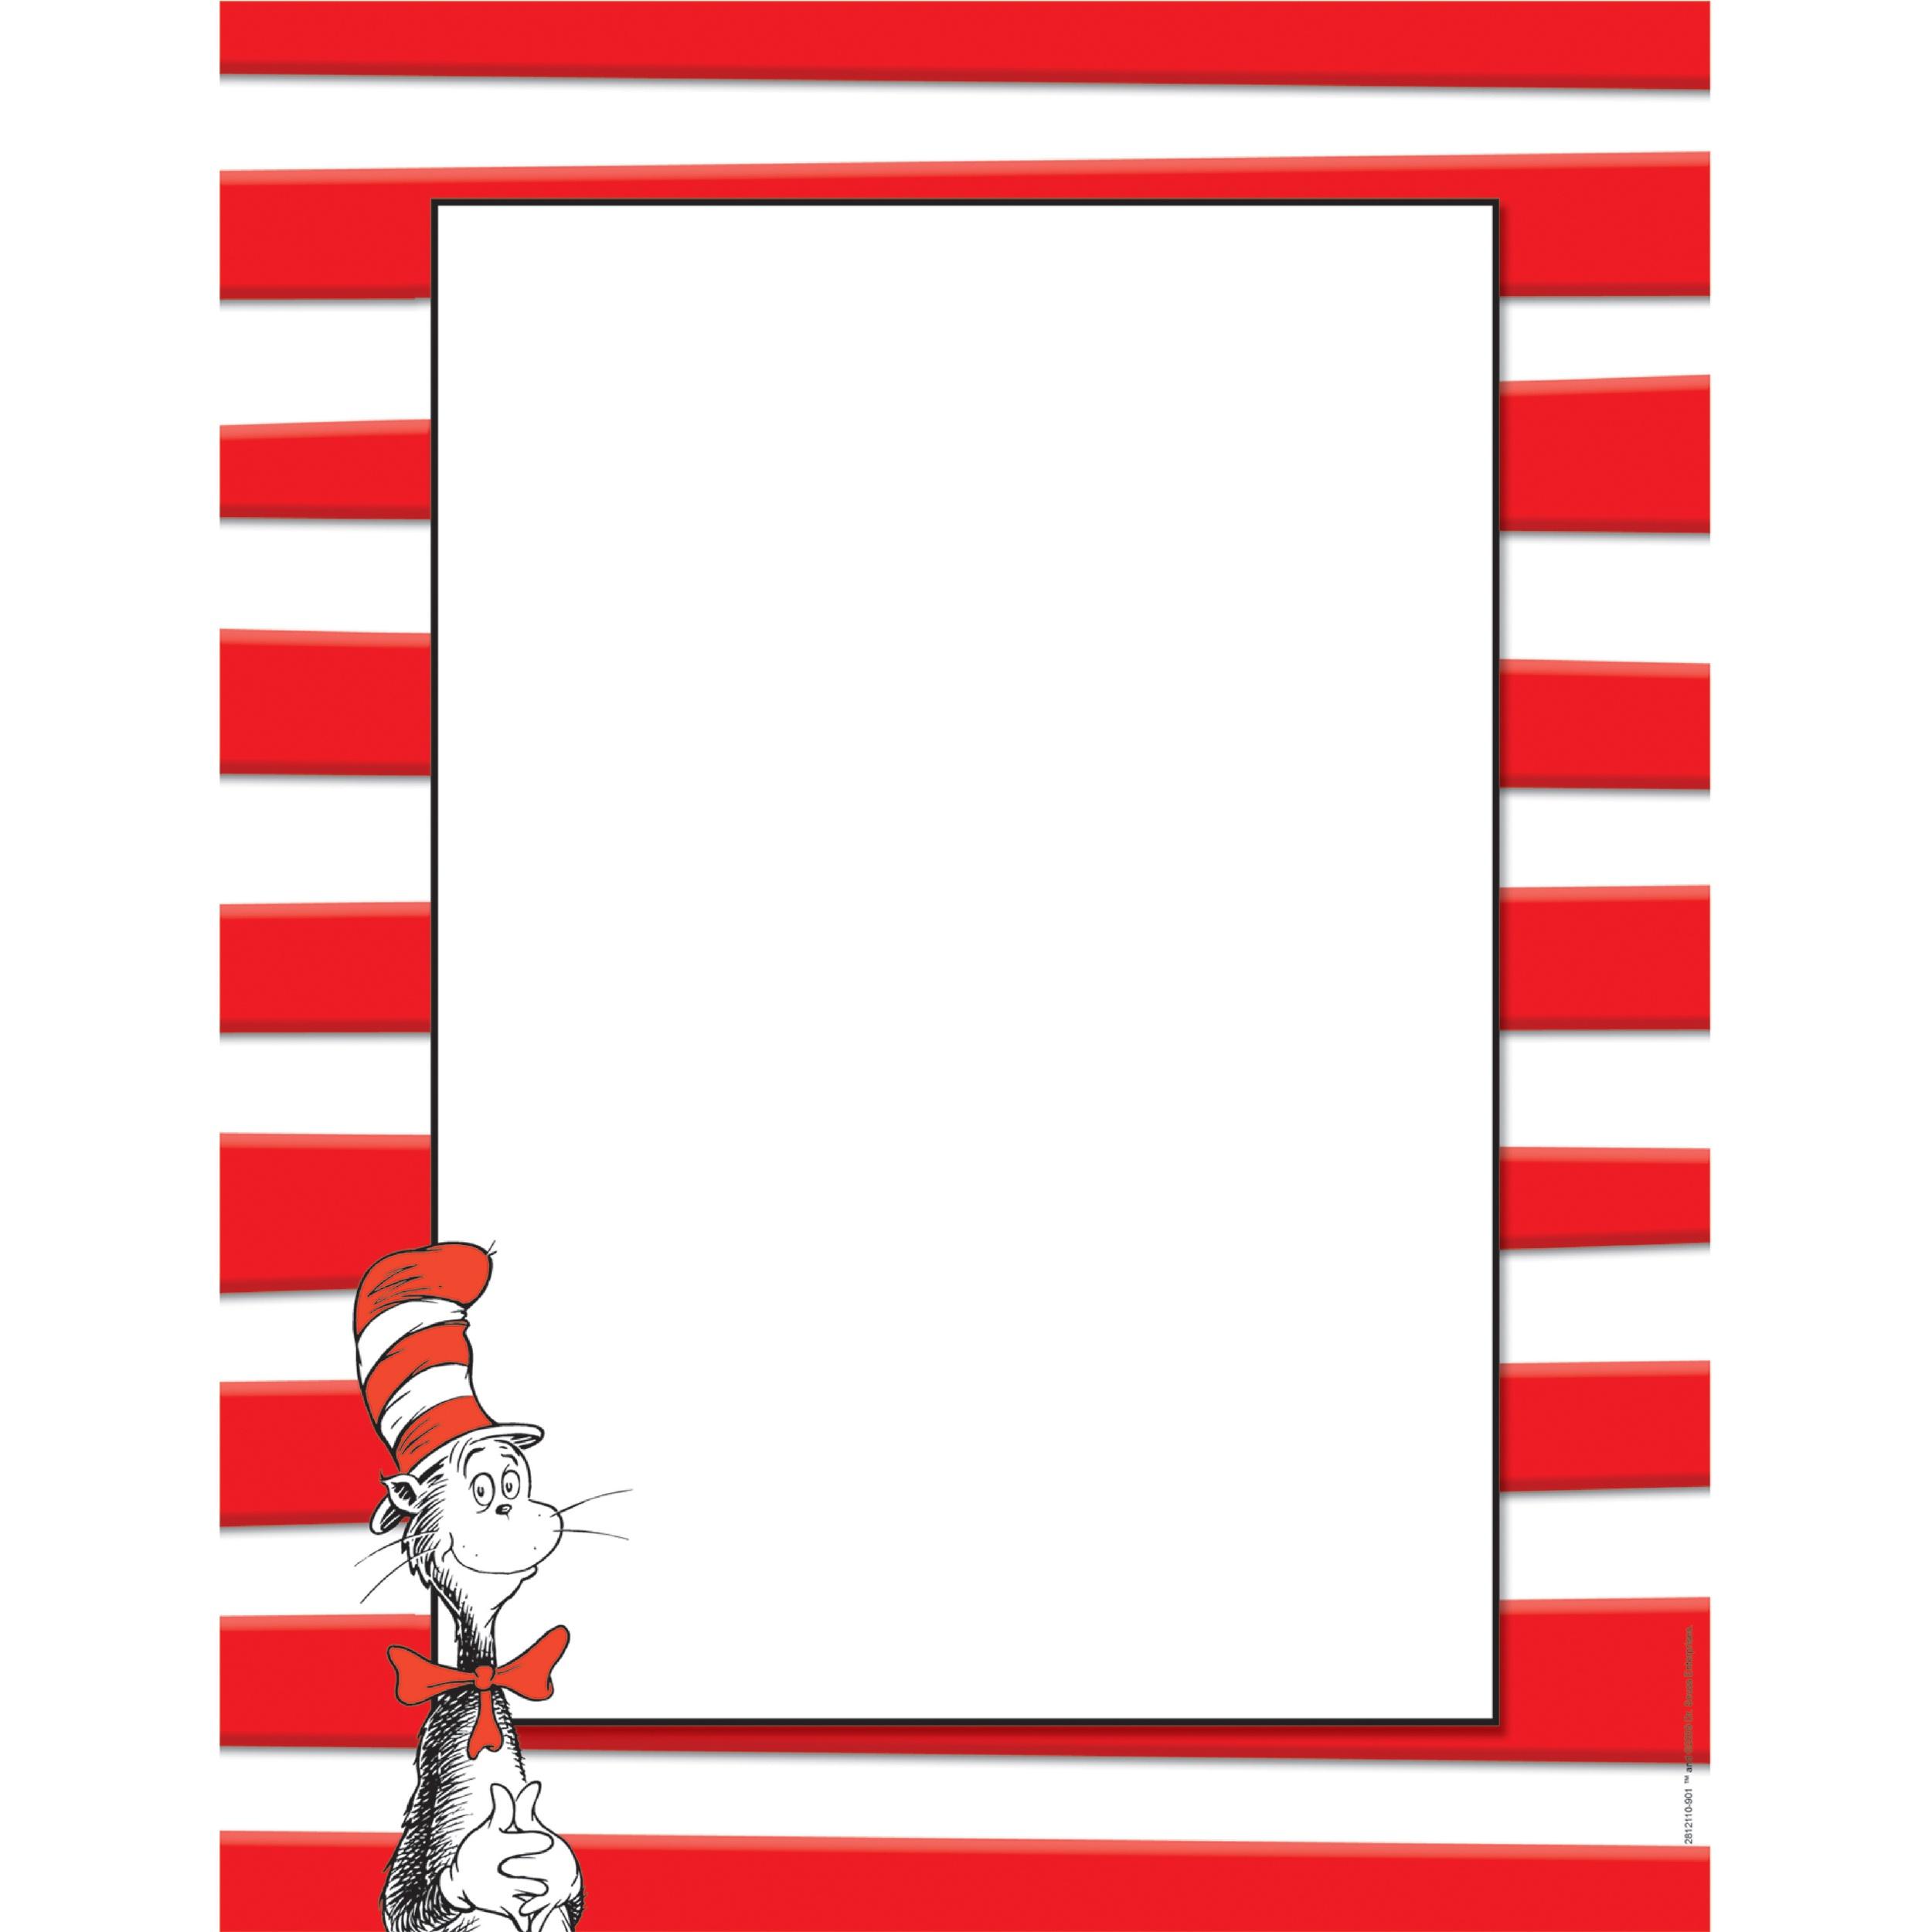 Dr Seuss Page Border   Free Download Best Dr Seuss Page Border On - Dr Seuss Free Printable Templates